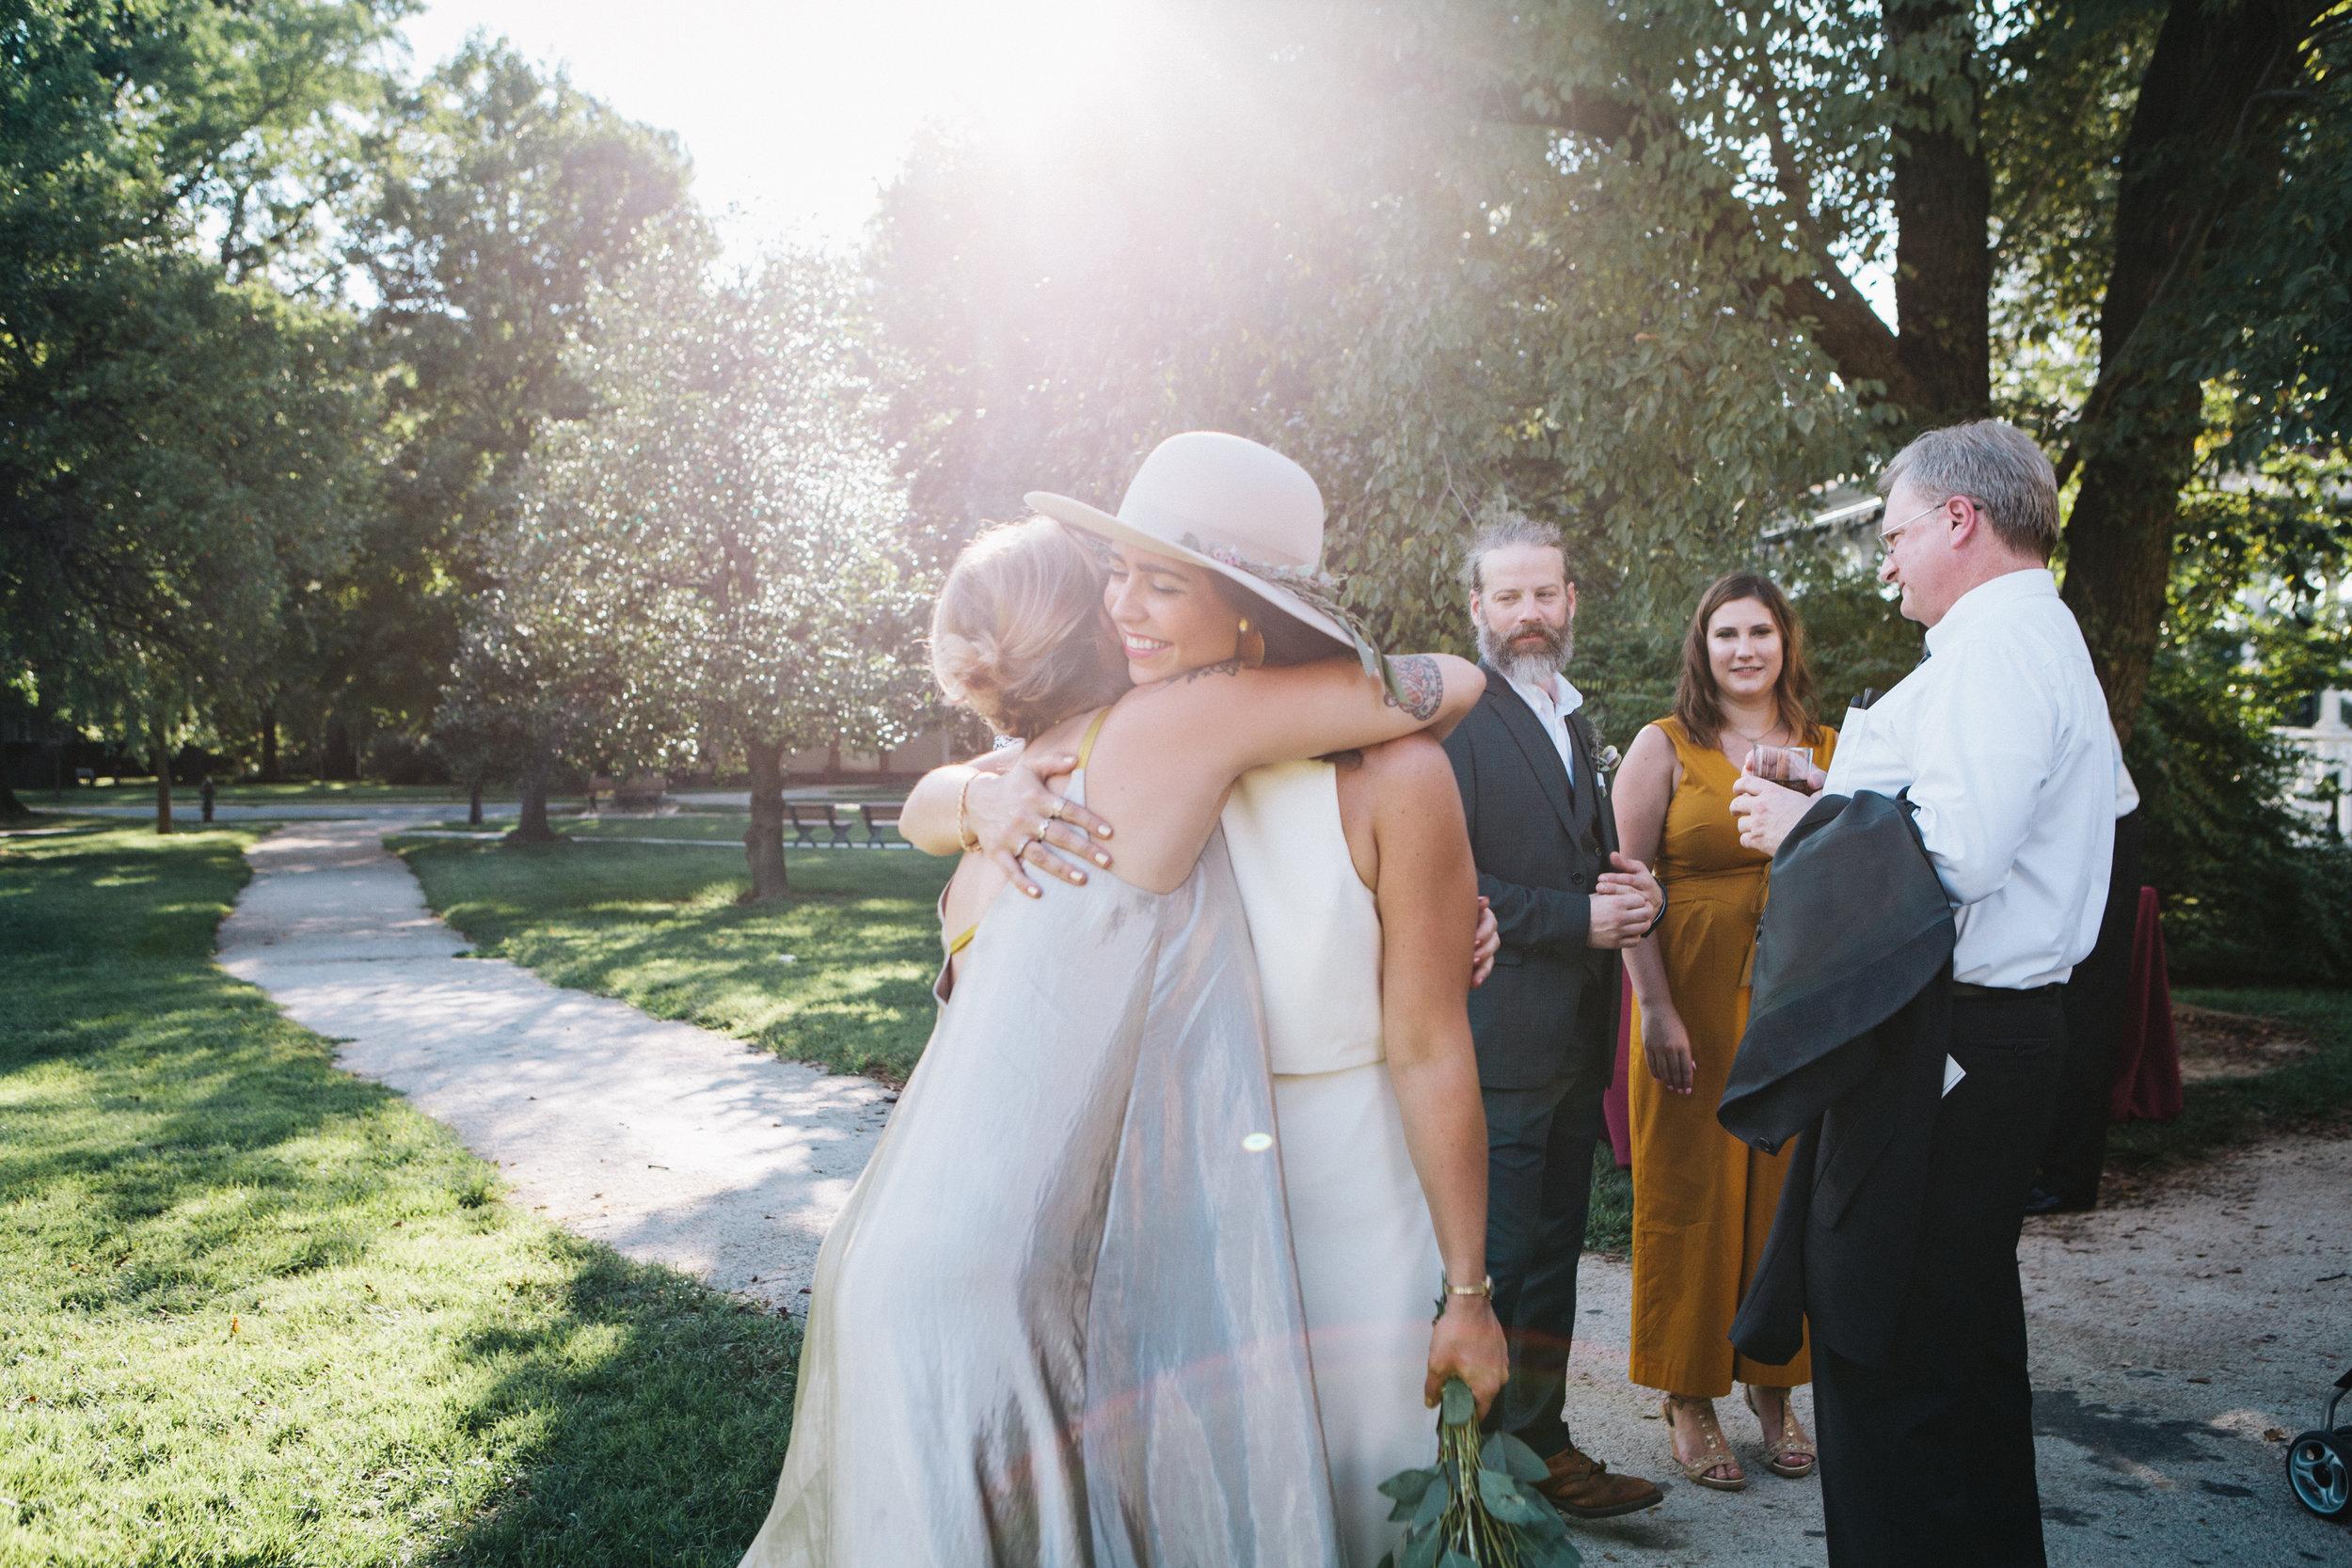 Harlan_LeeHart_Wedding-100.jpg